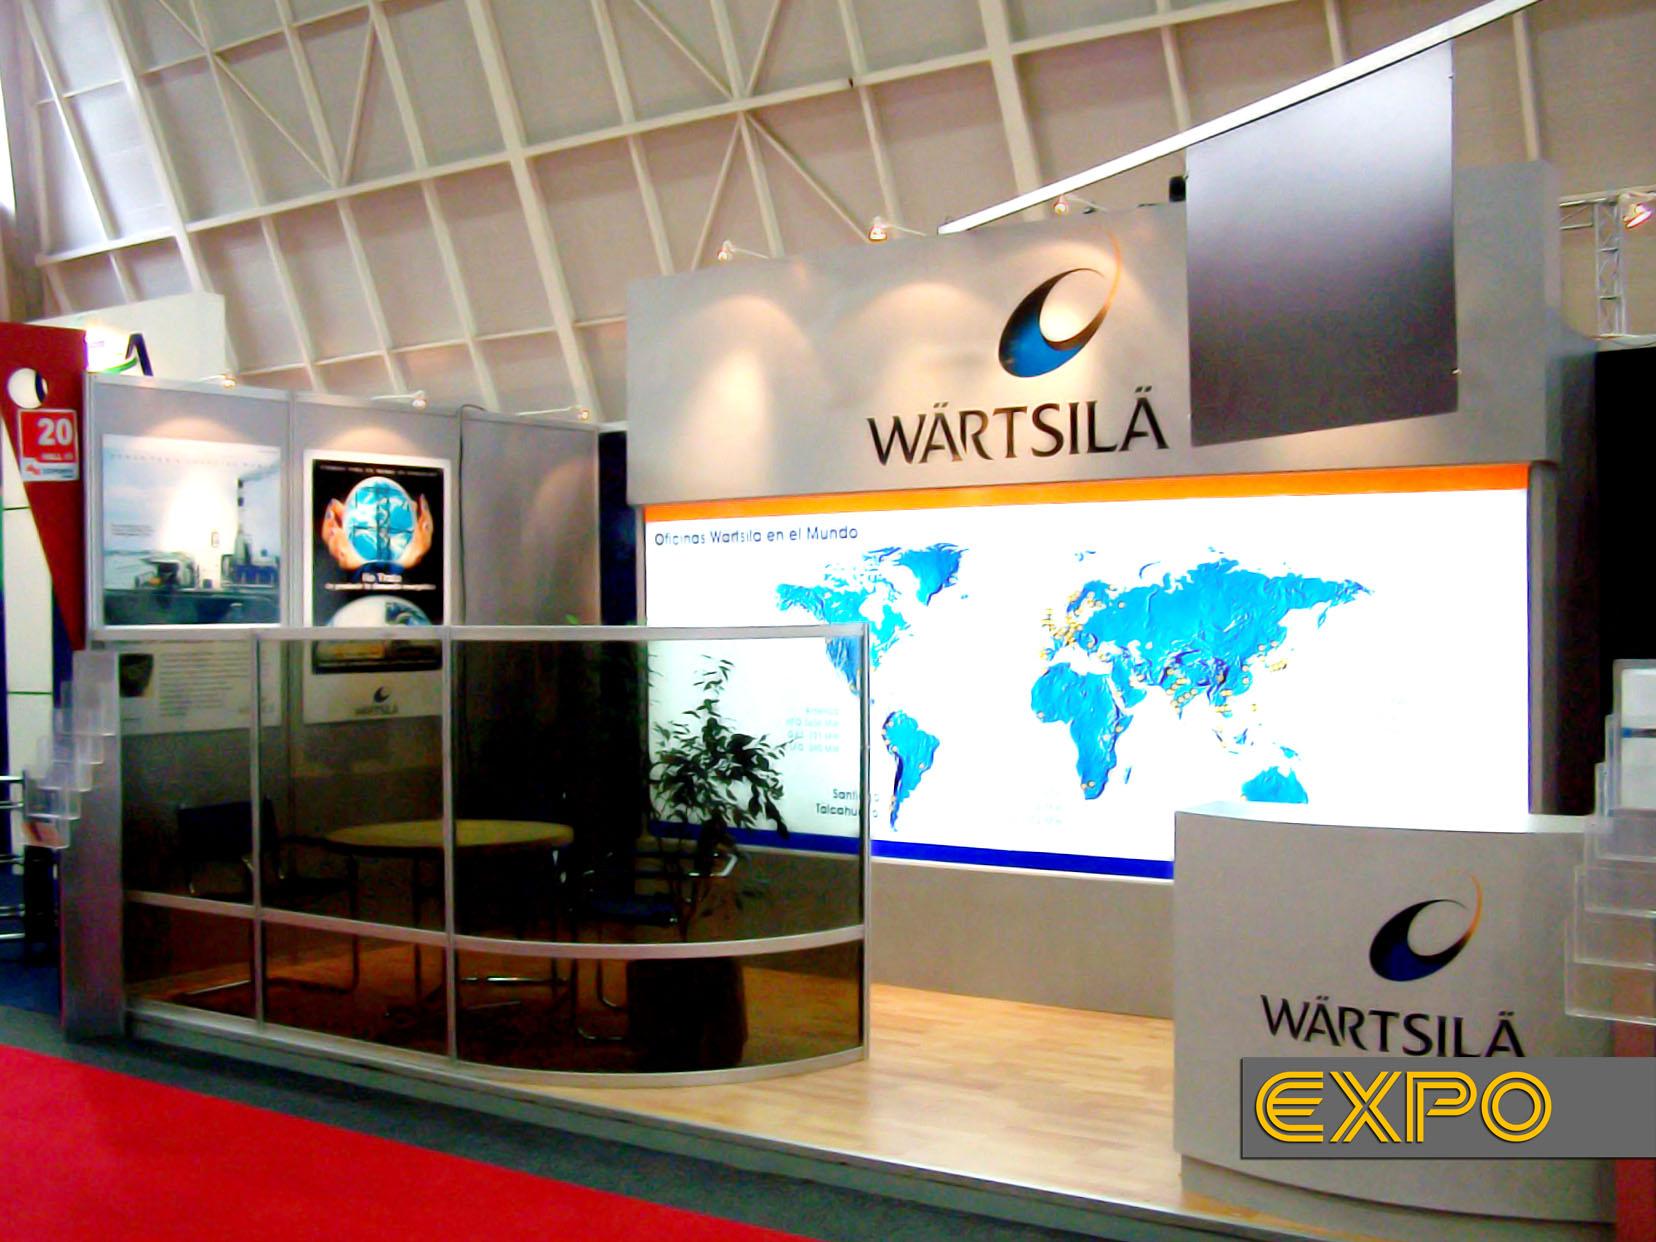 Wartsila - Expomin 2006